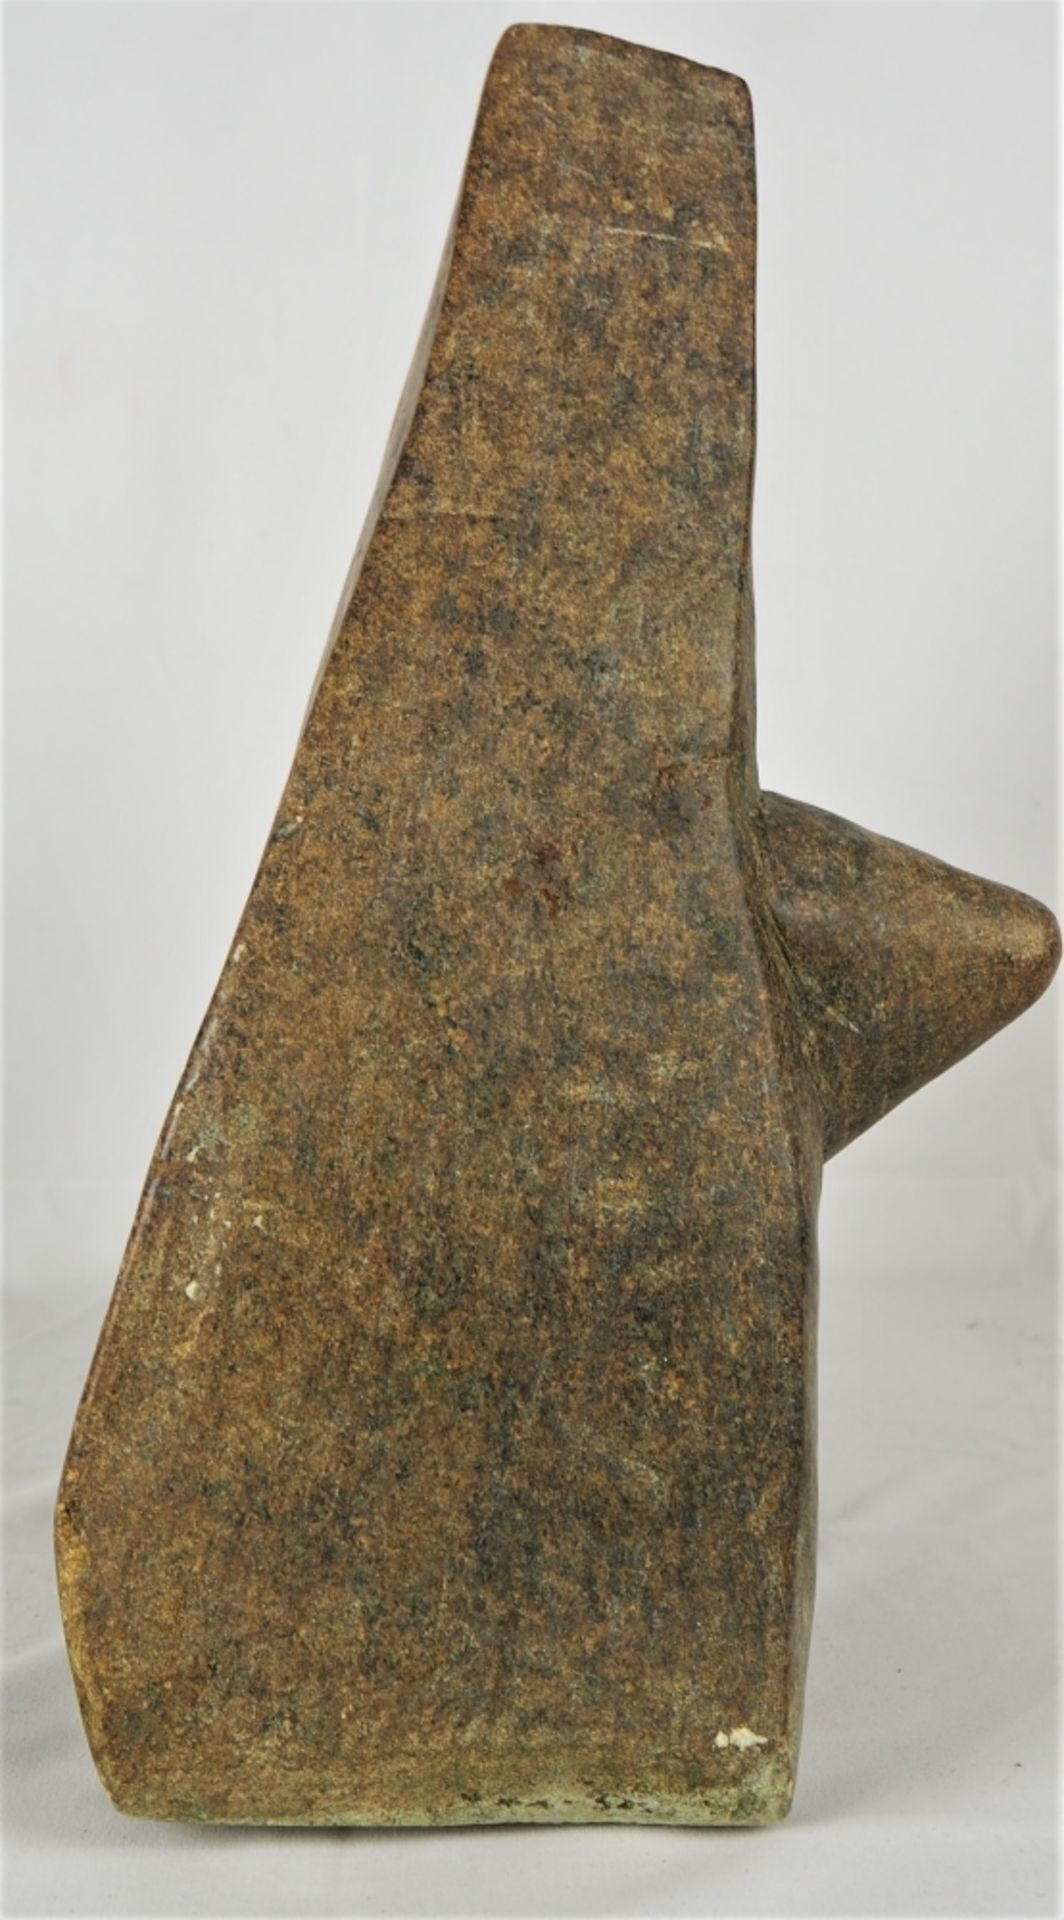 Los 371 - Kakoma Kweli (1908, Angola - 1995, Zimbabwe) - Shona-SkulpturMassive, minimalistisch gestaltete...